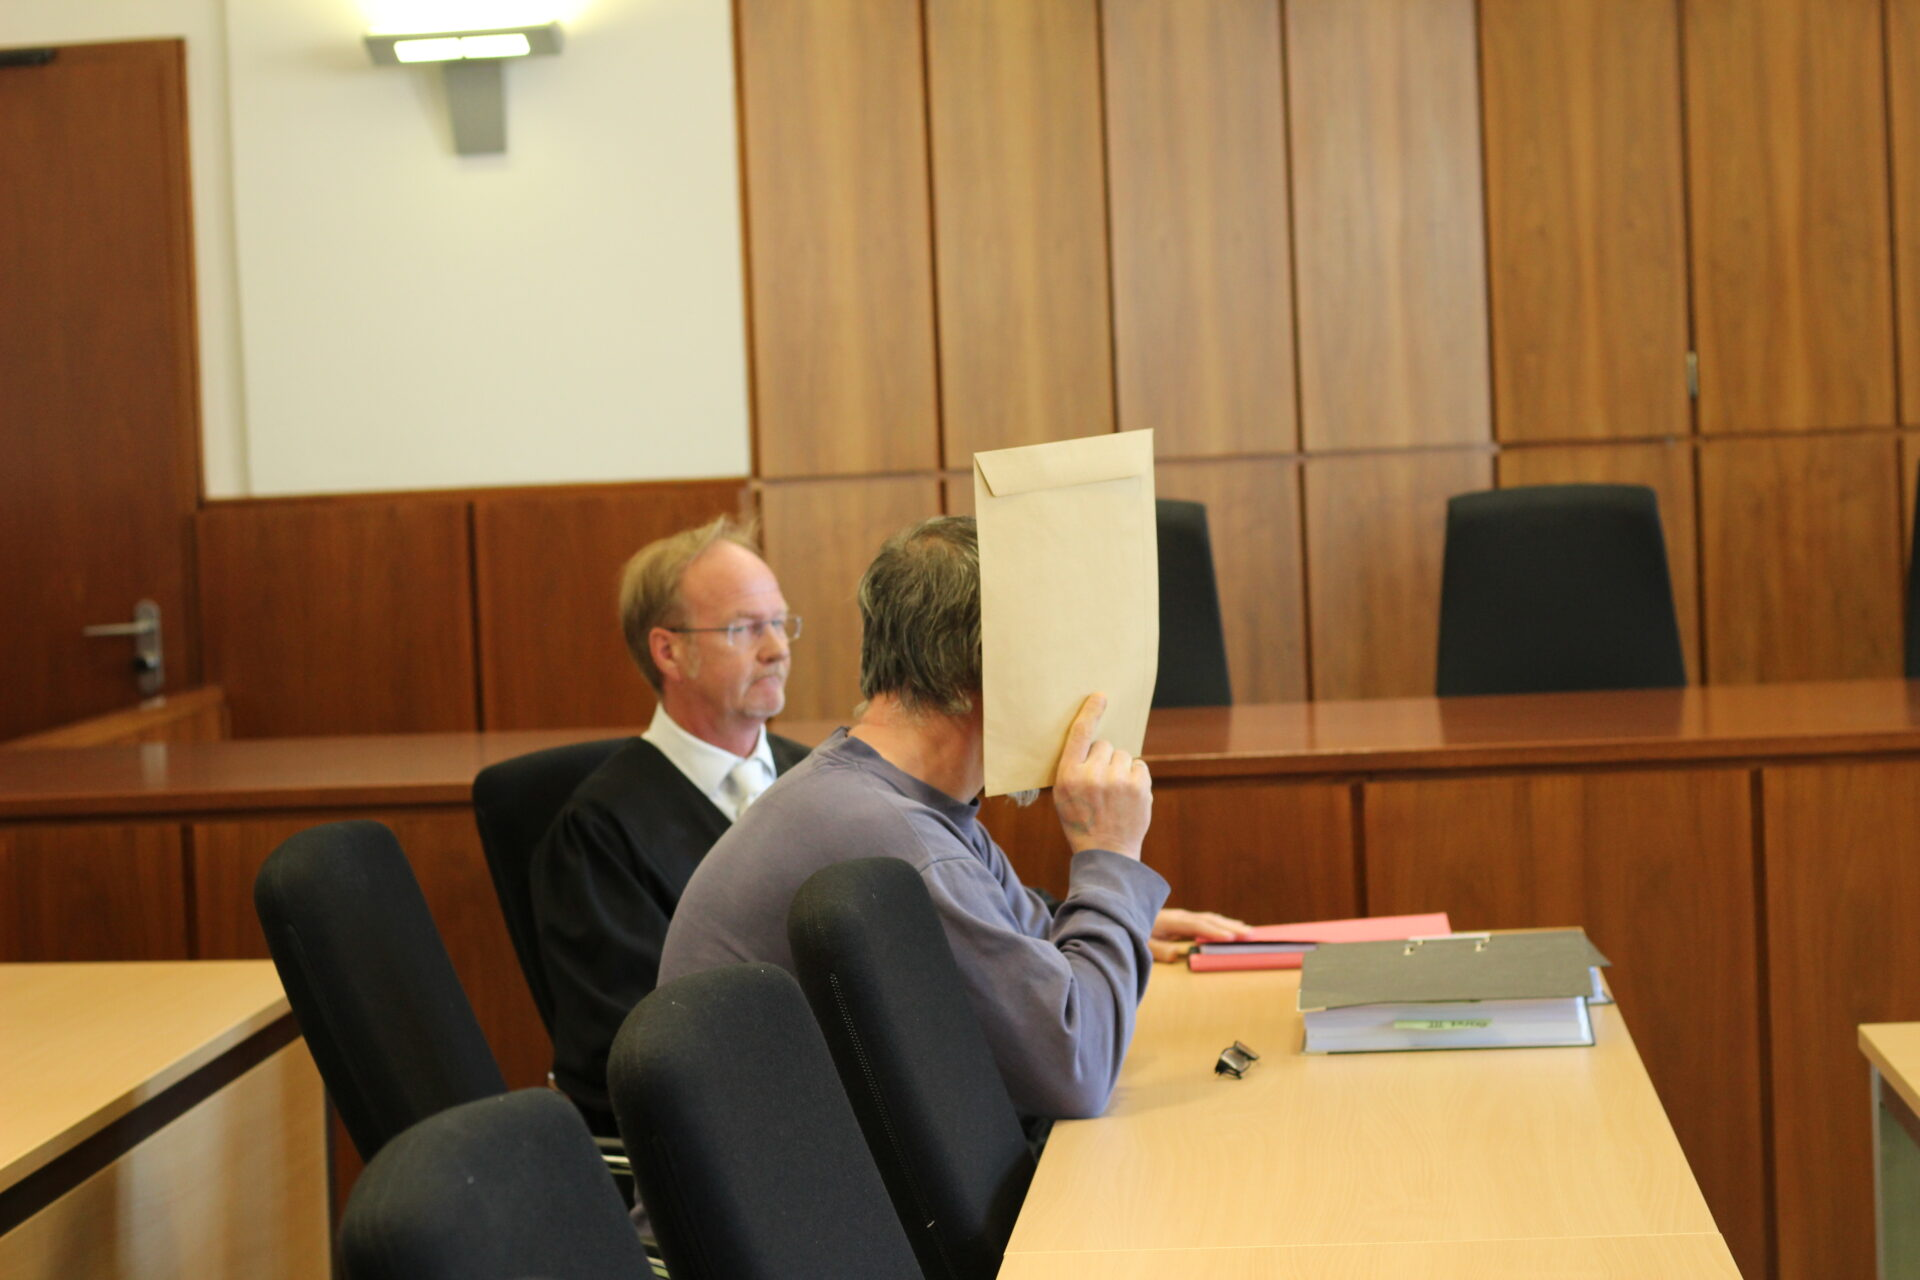 Mordprozess gegen Michael S. vor dem Landgericht hat begonnen